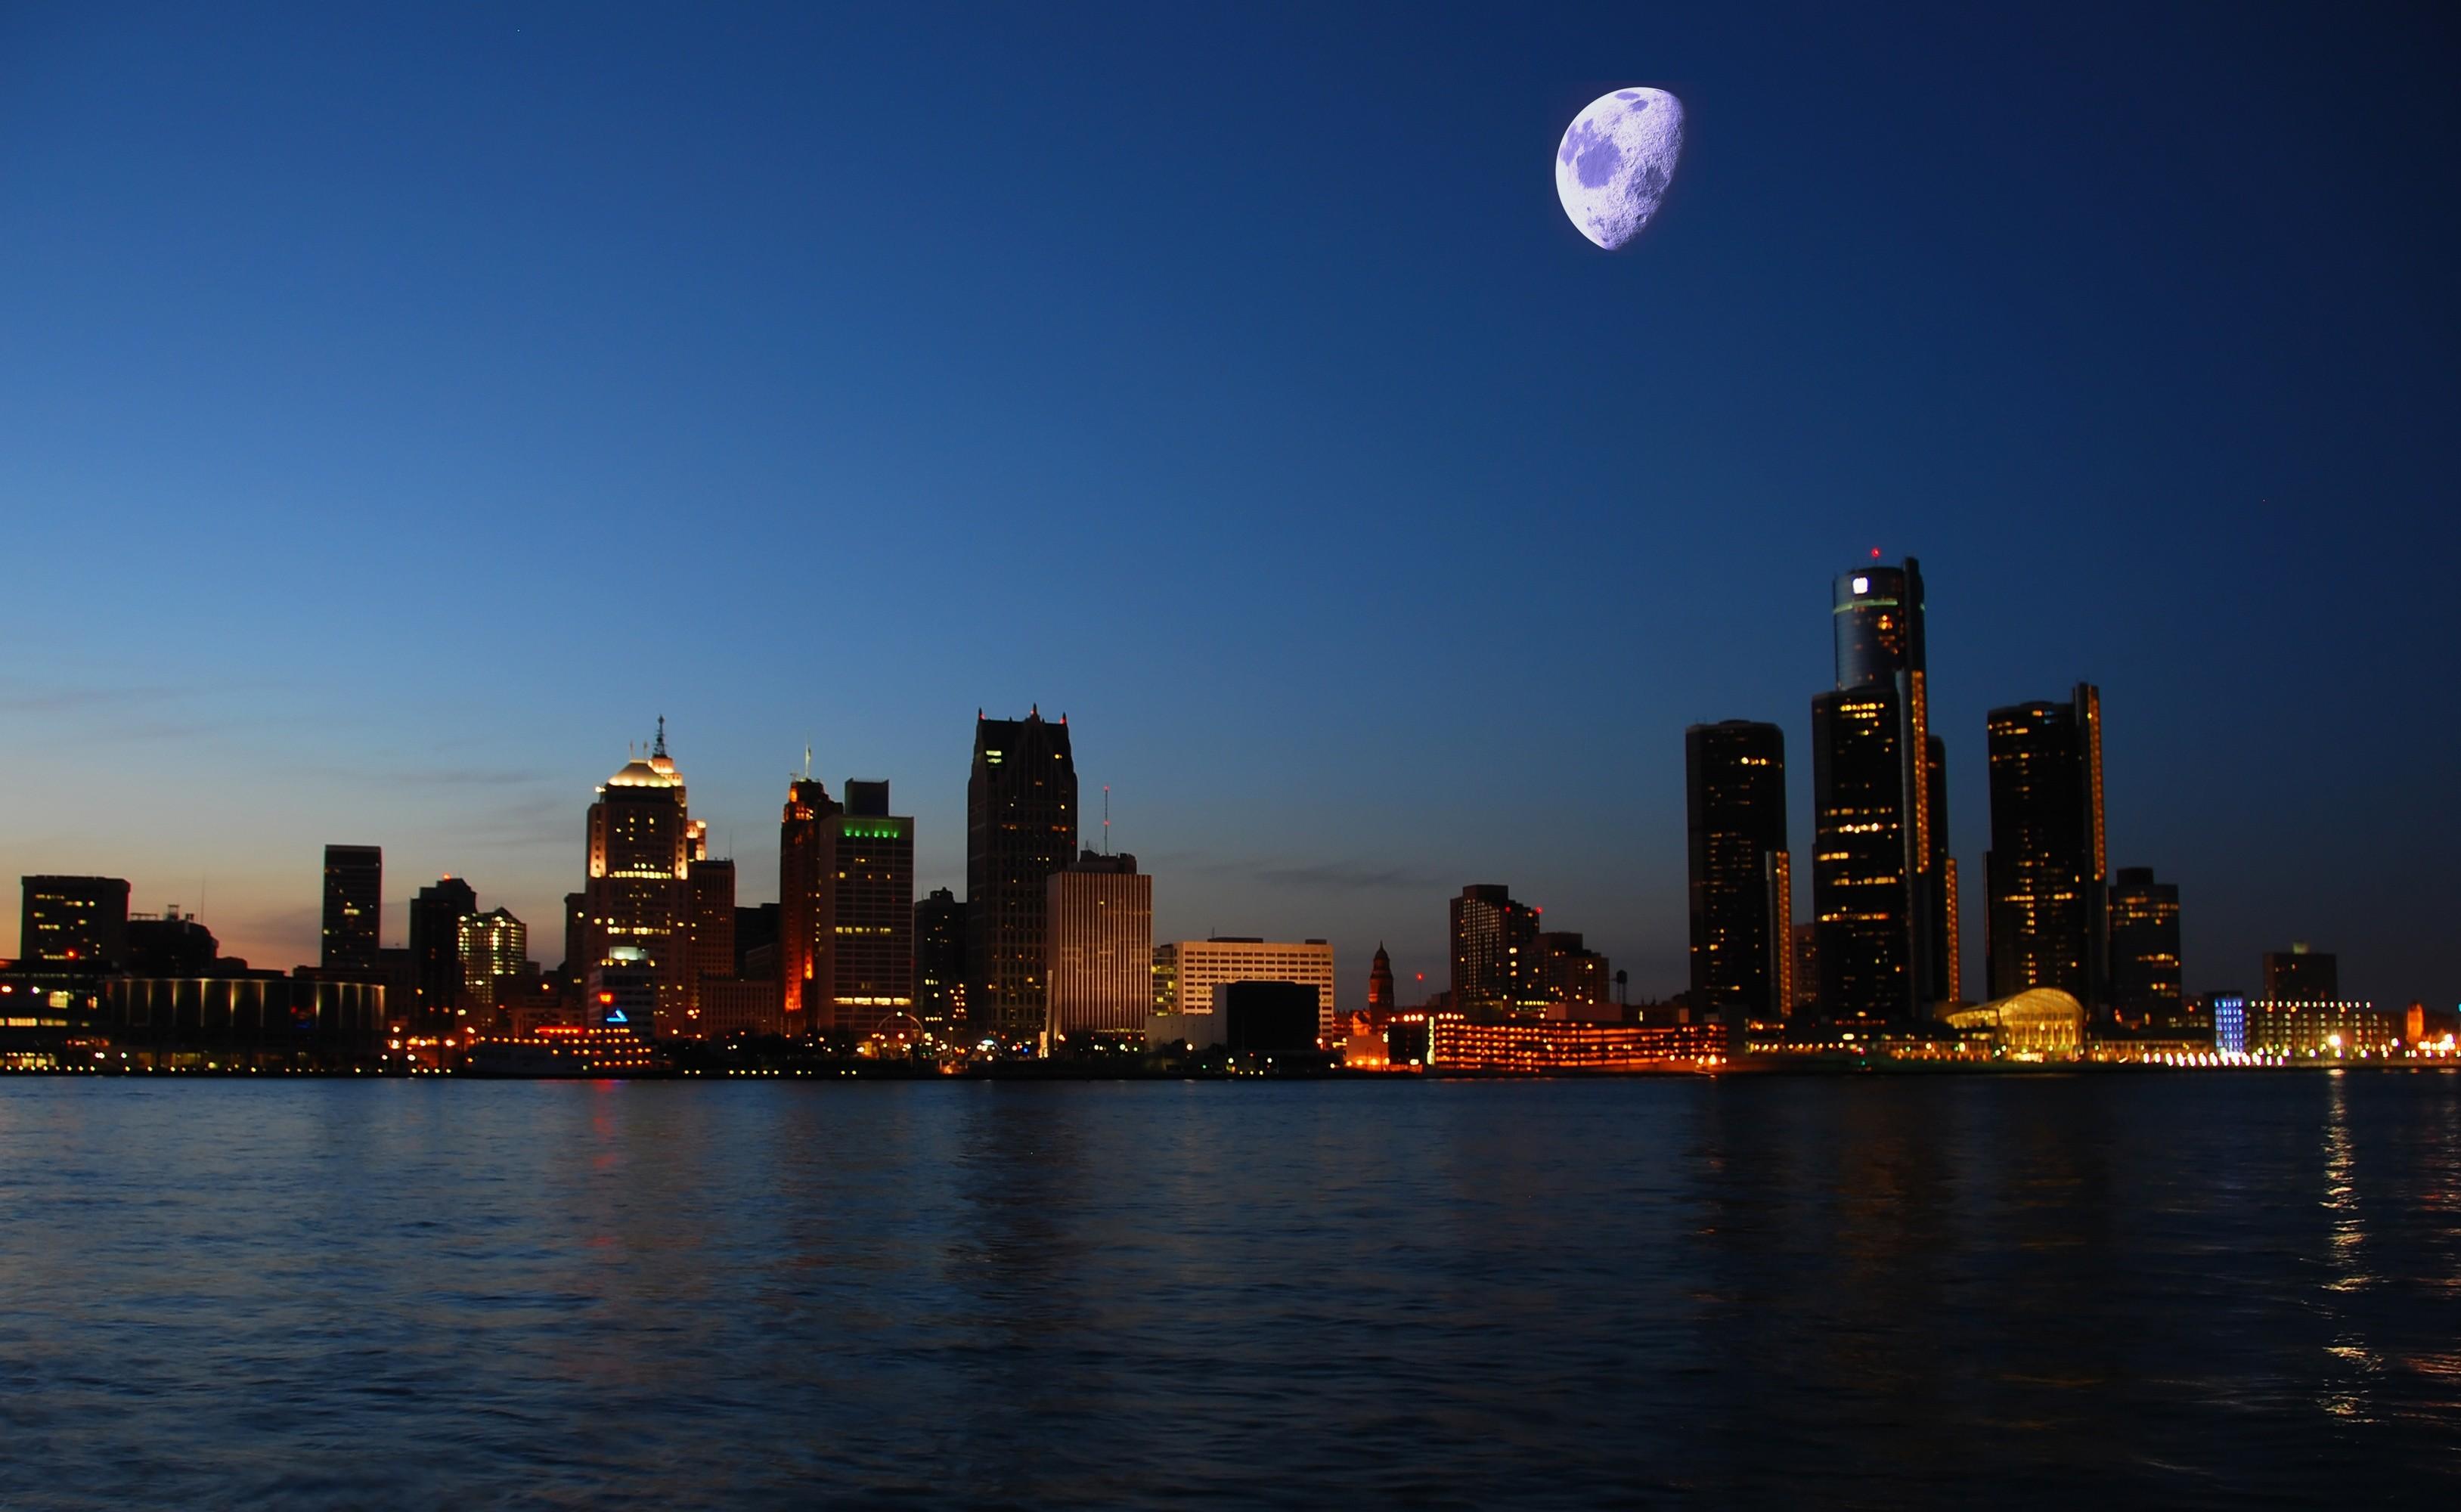 Detroit skyline wallpaper wallpapertag - Skyline night wallpaper ...